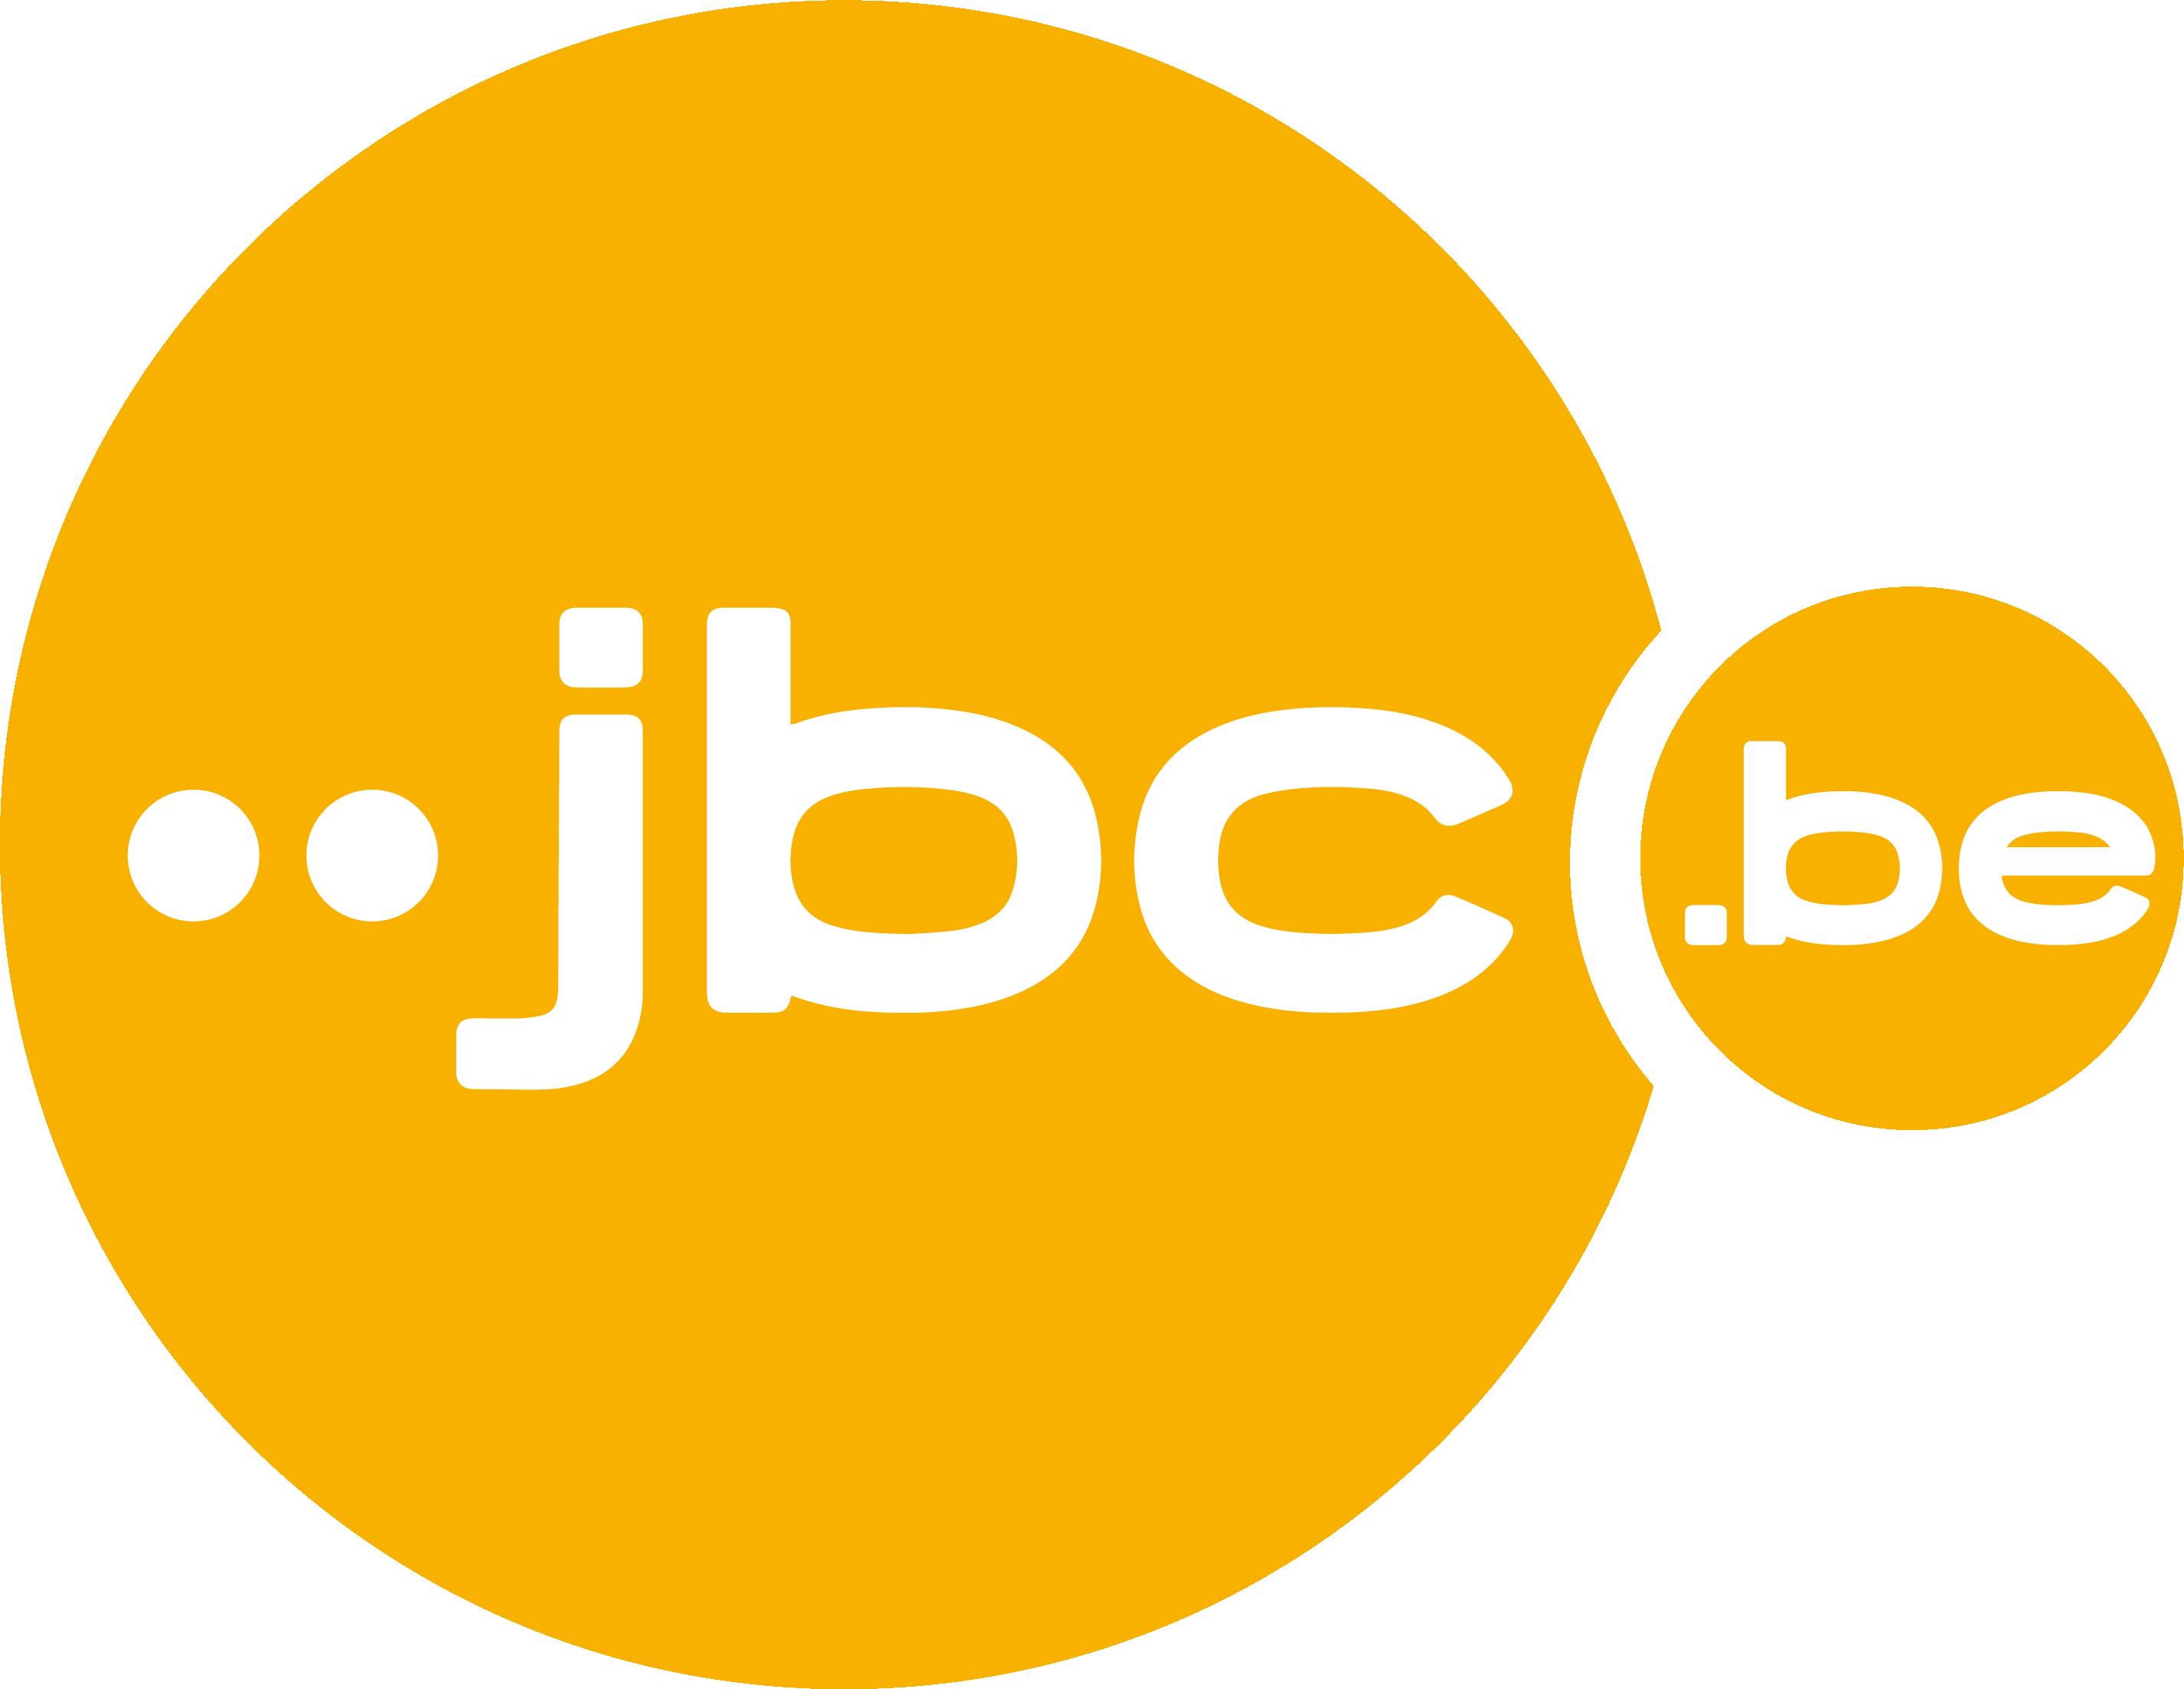 JB Cbe logo geel 1080